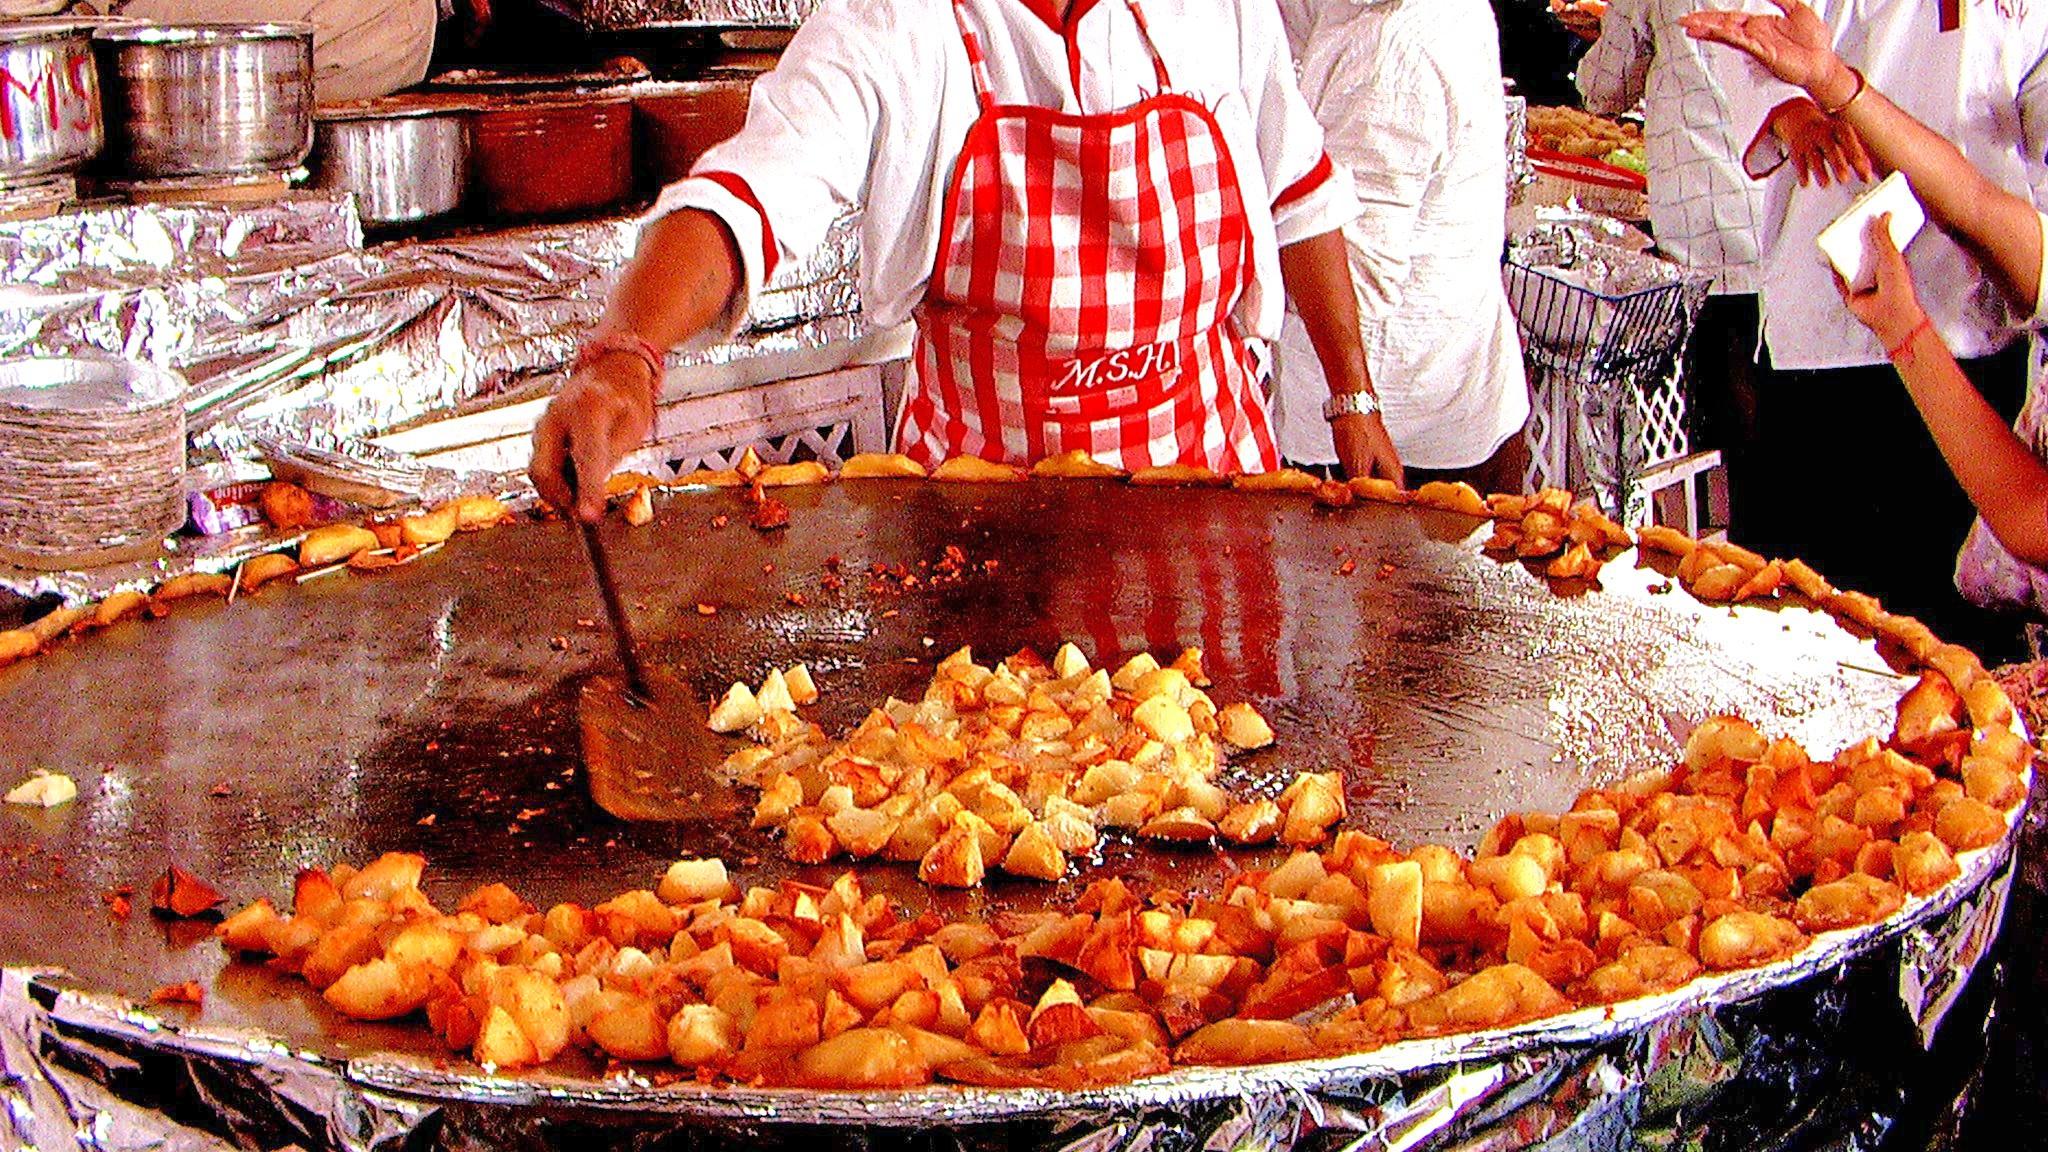 Delhi's Street Food